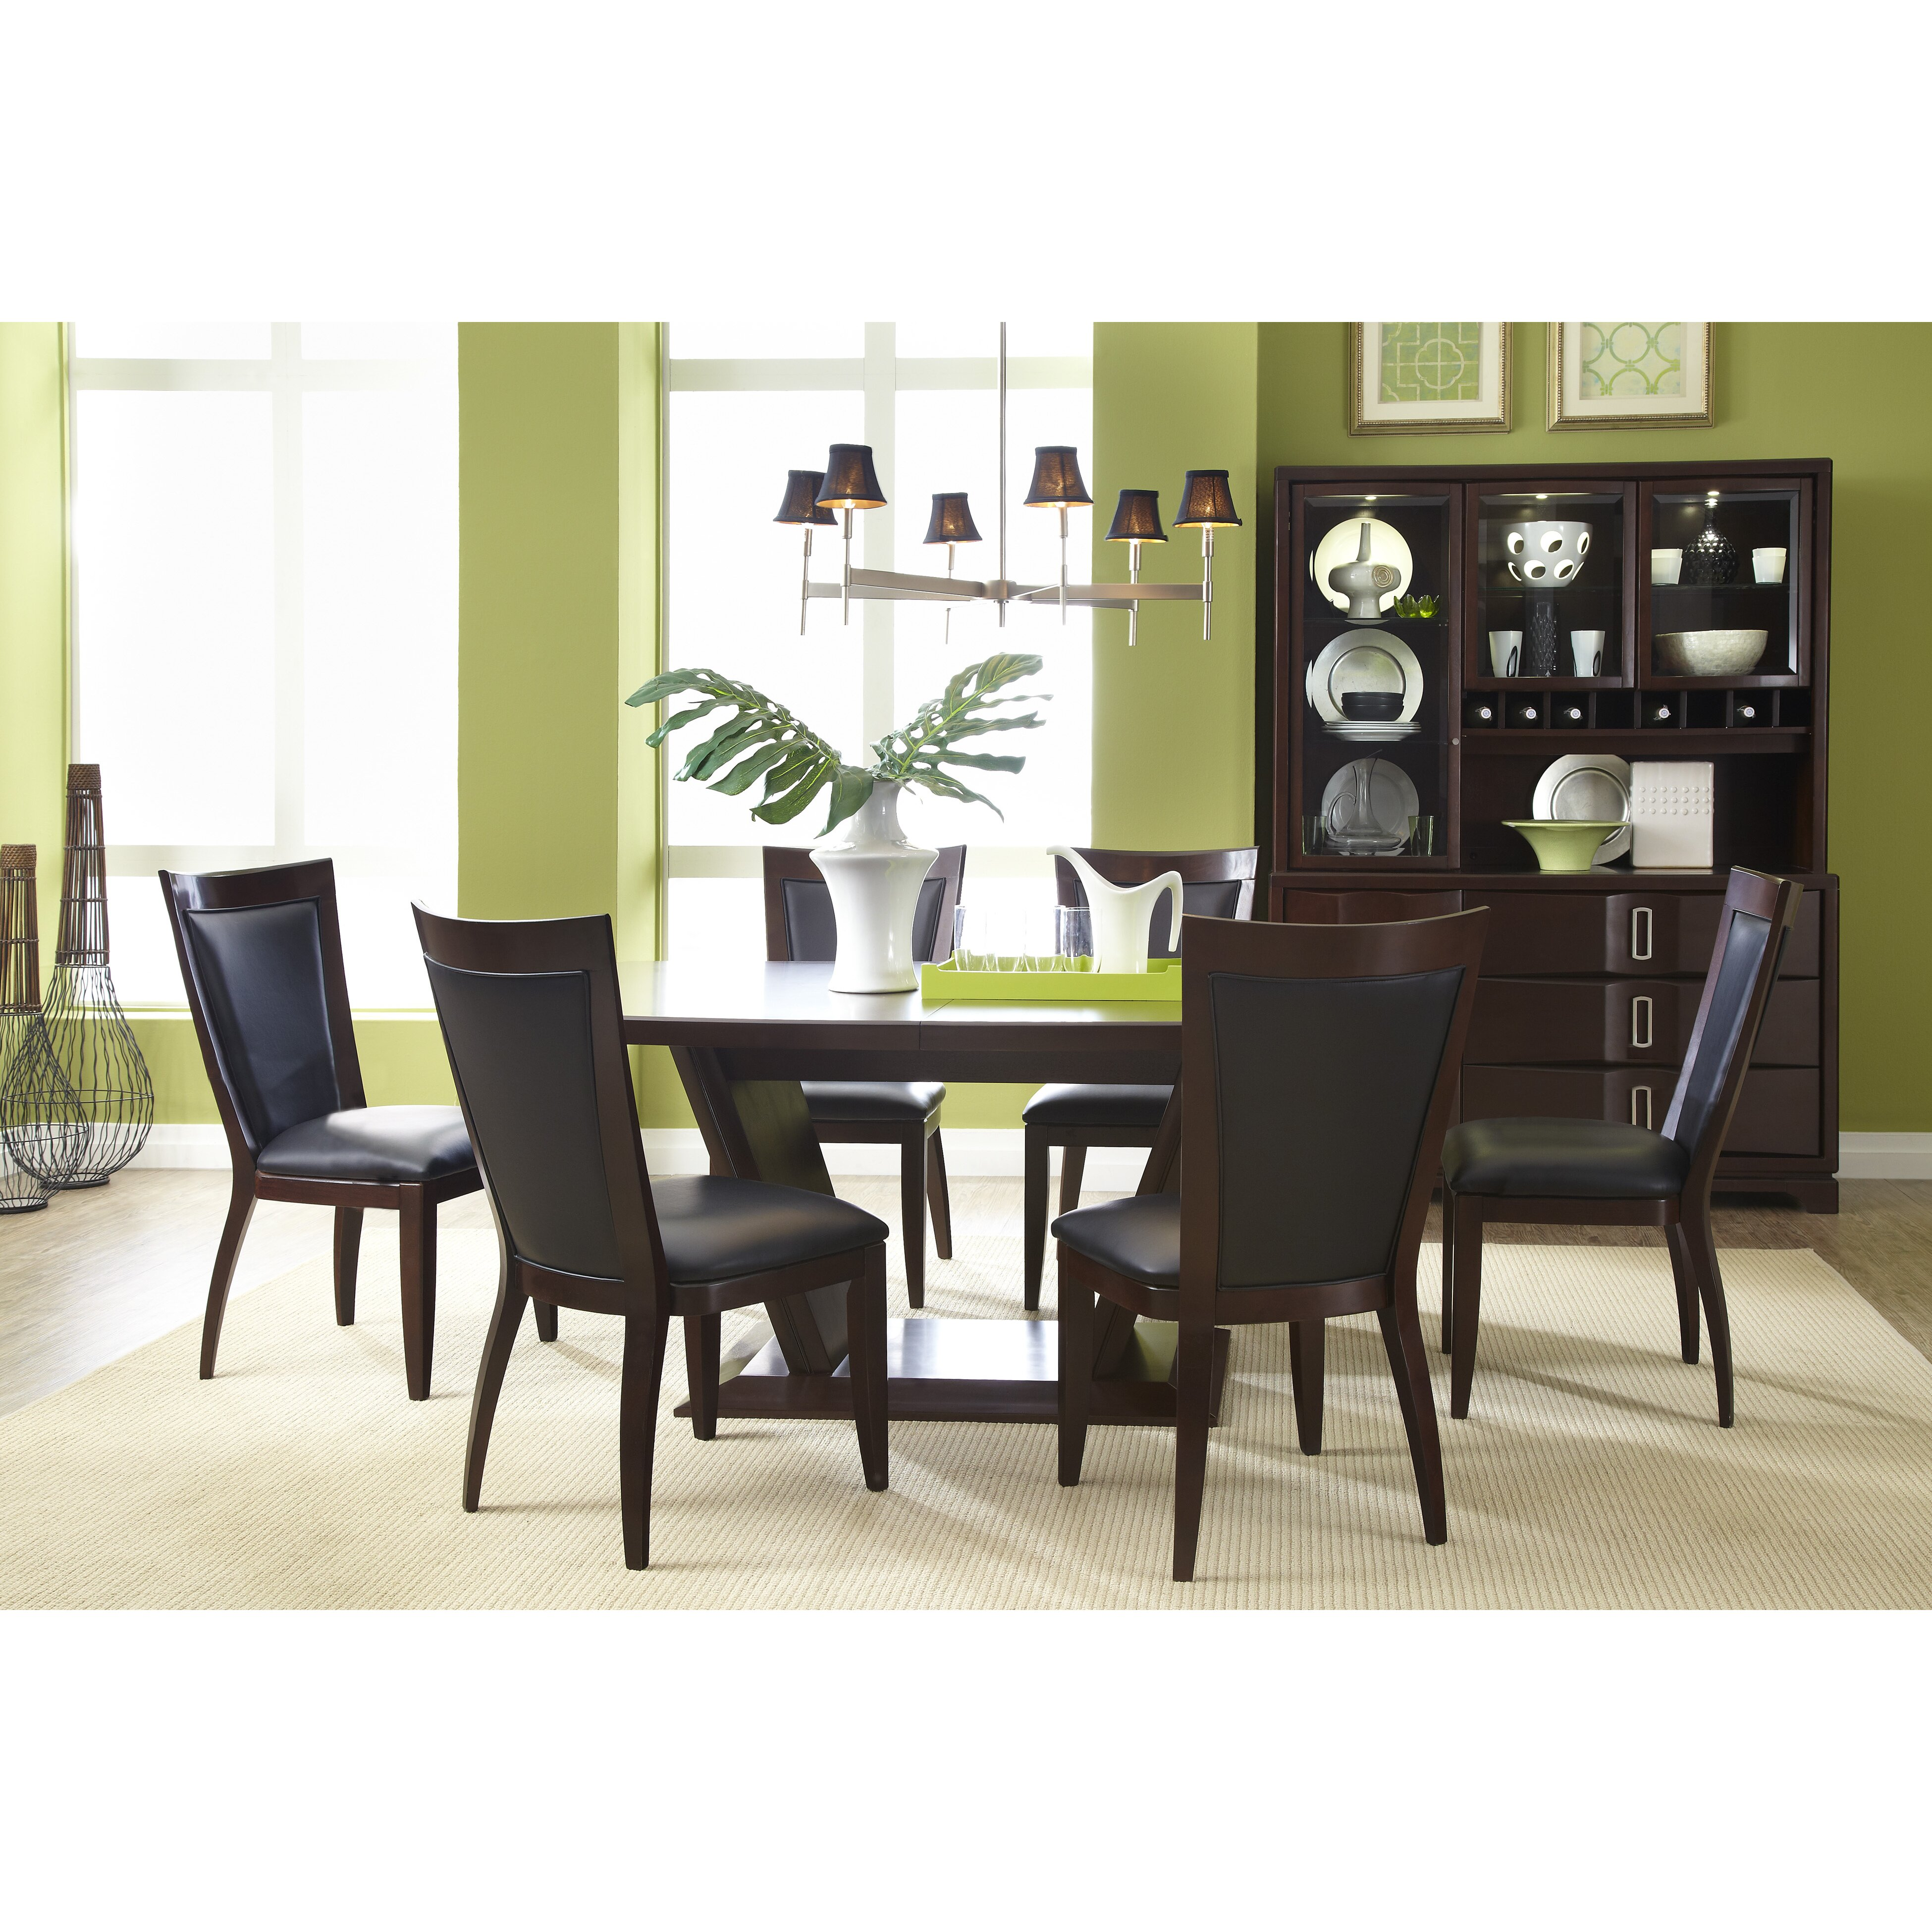 Casana Furniture Company Brooke China Cabinet